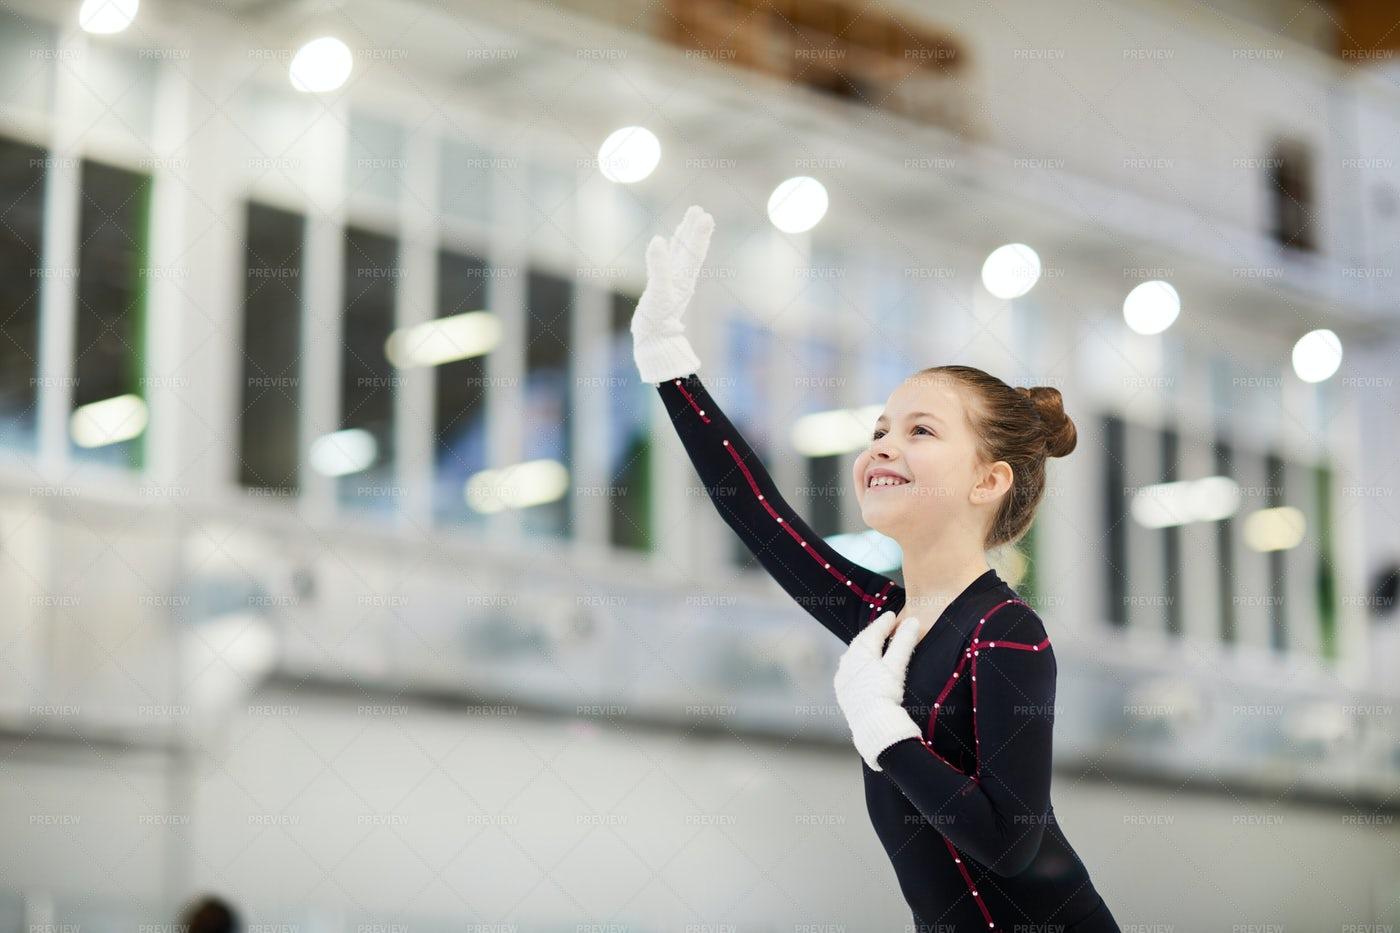 Little Figure Skater Waving: Stock Photos